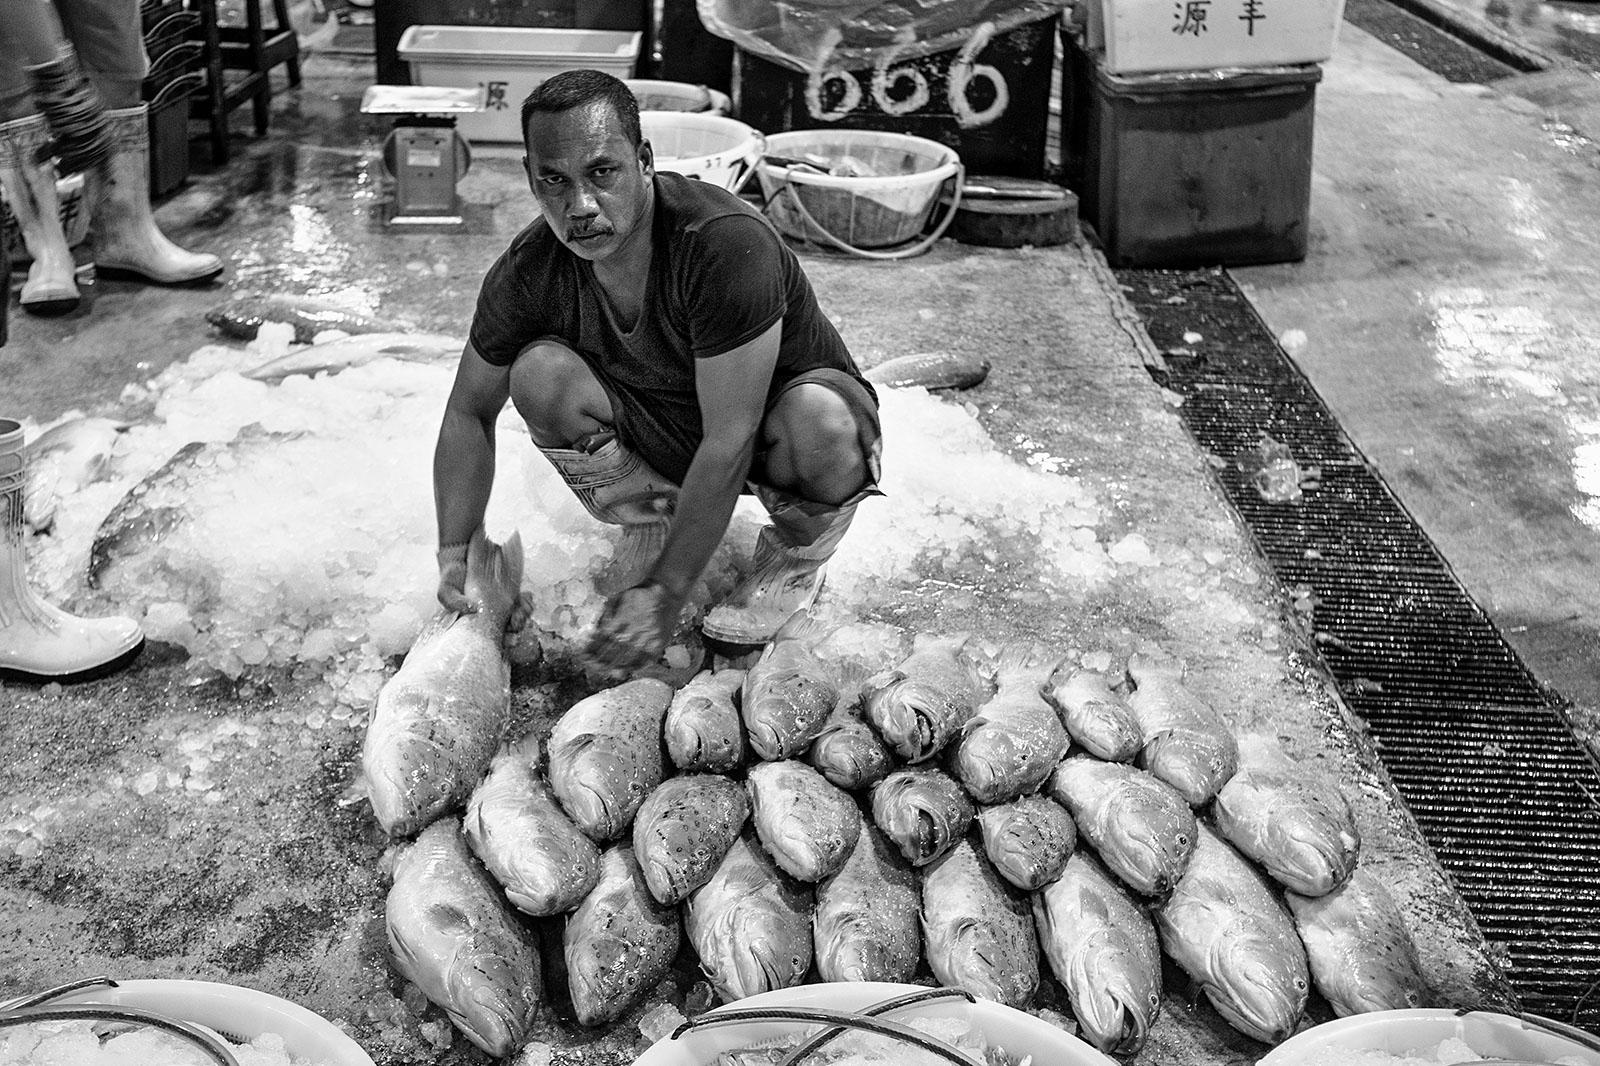 JurongFishPort Documentary_28022016_LAN3321bw.jpg